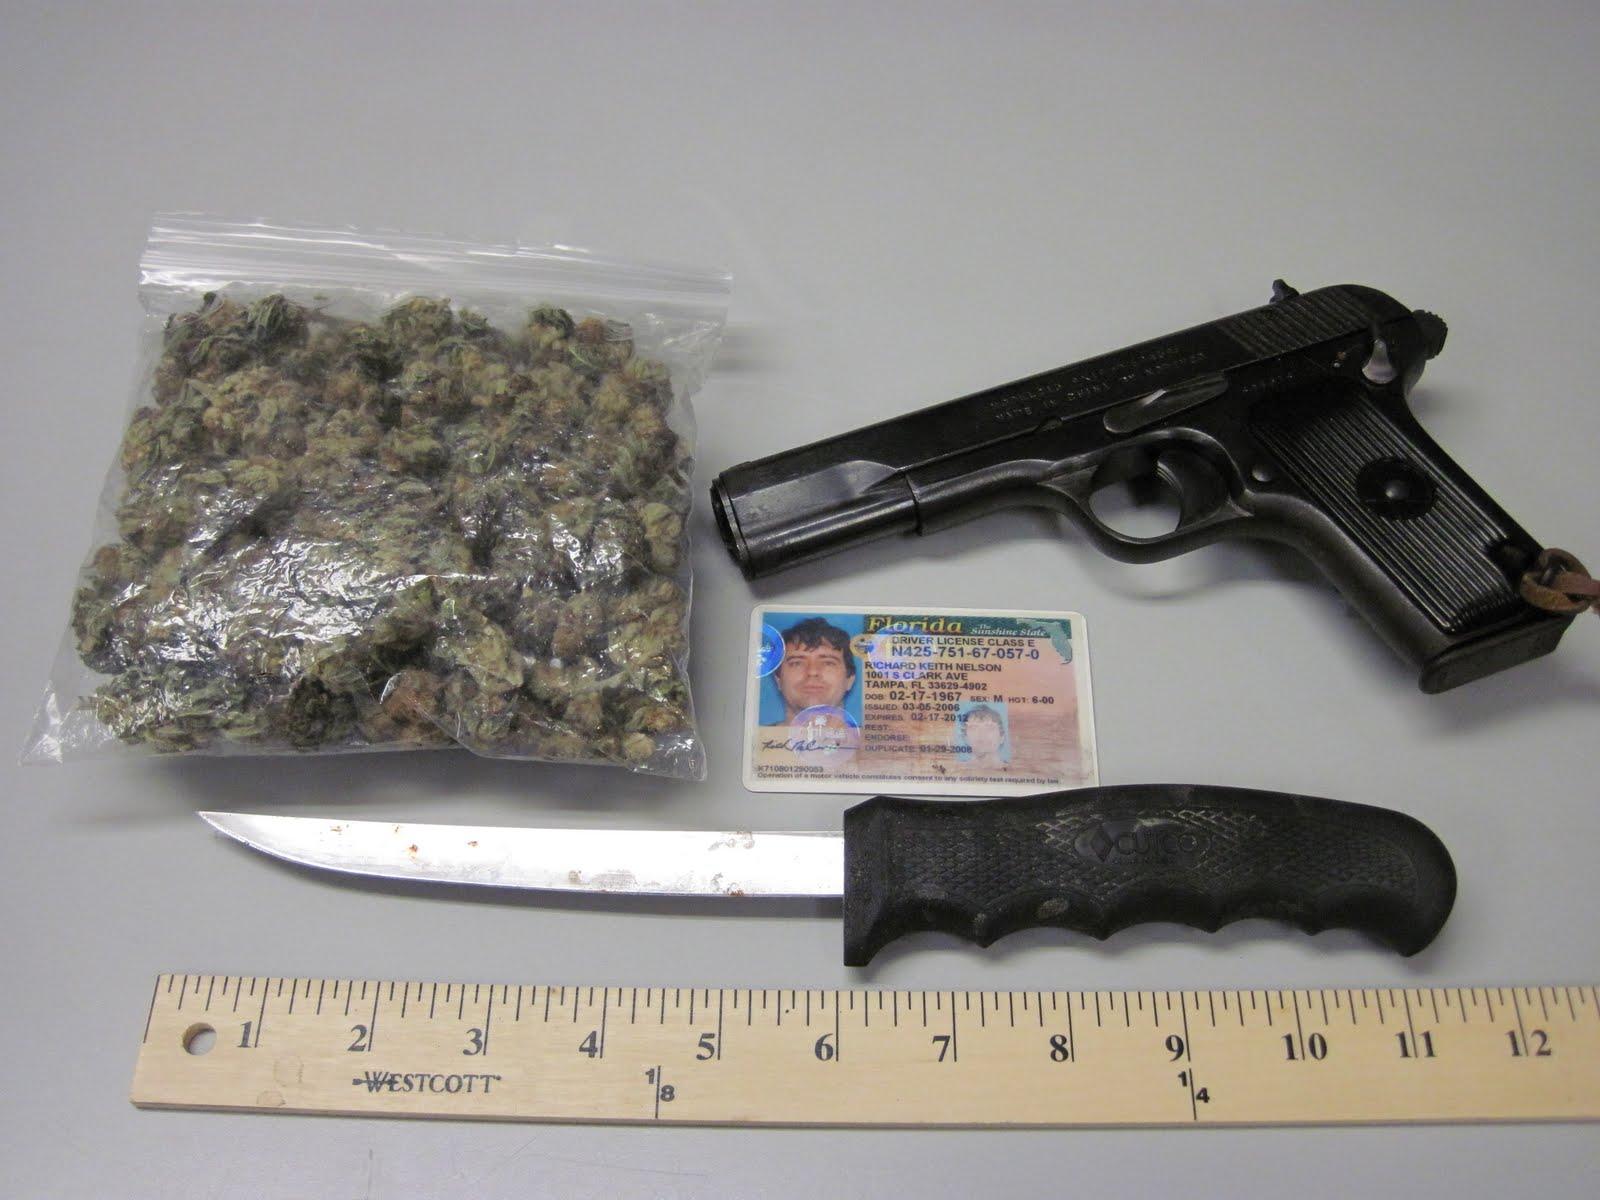 09152010 Drugs And Gun